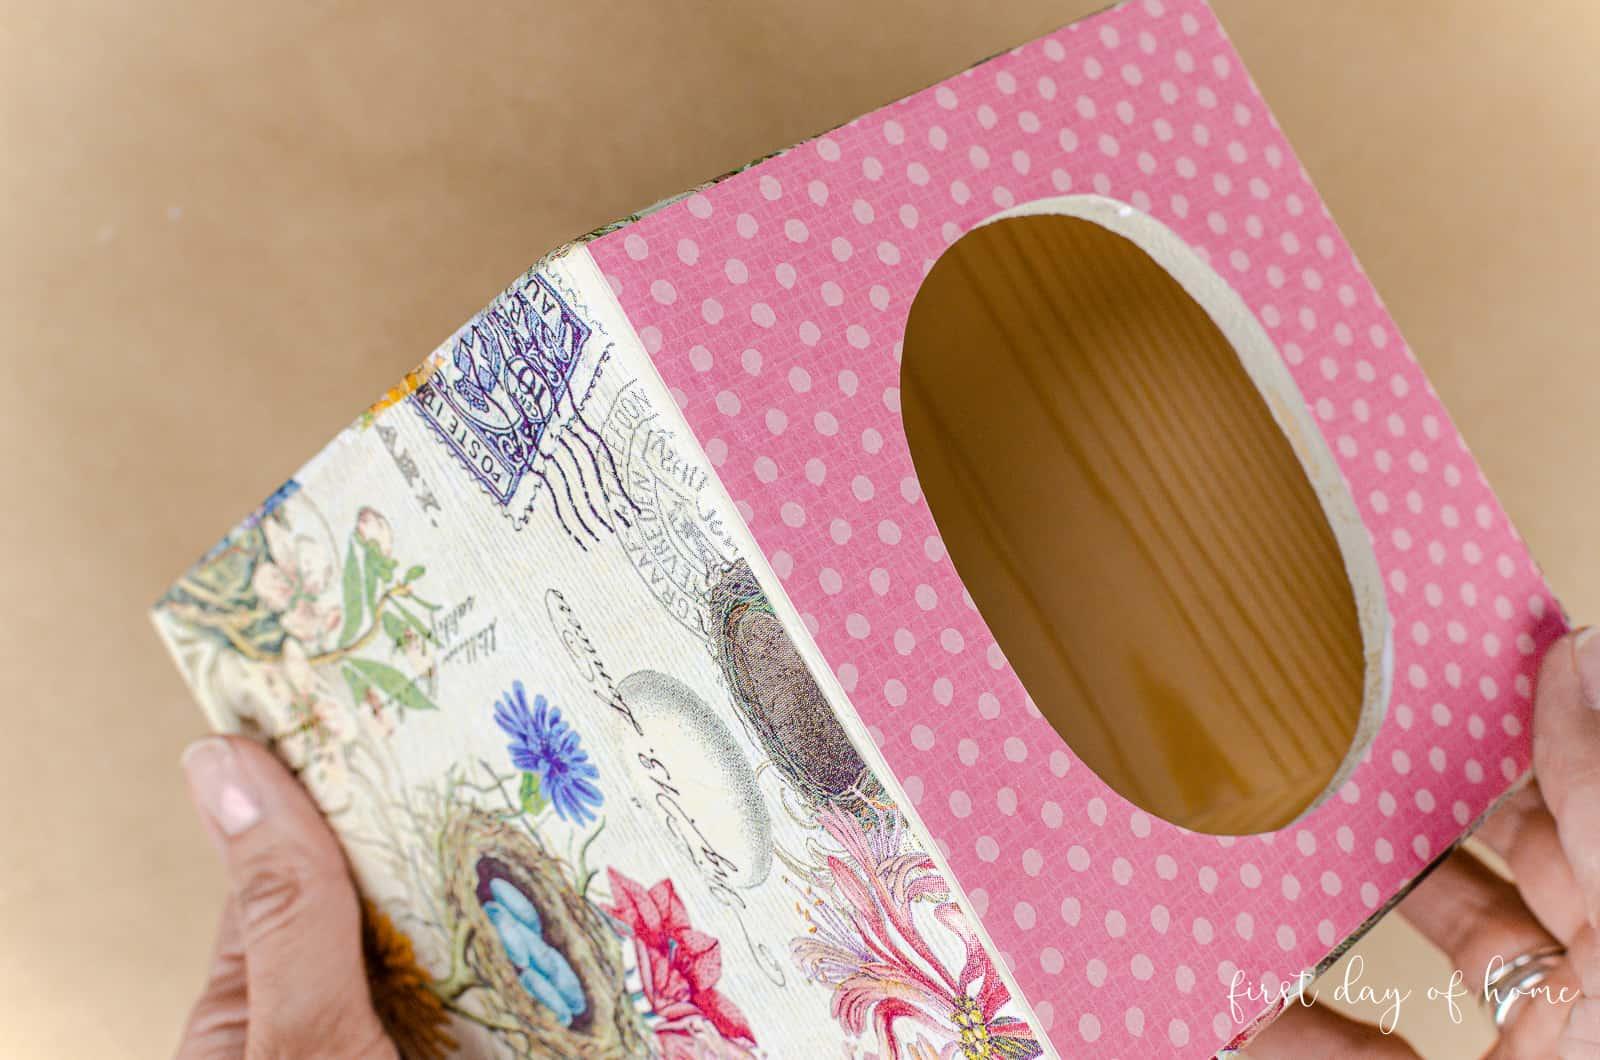 Side view of DIY decoupage tissue box